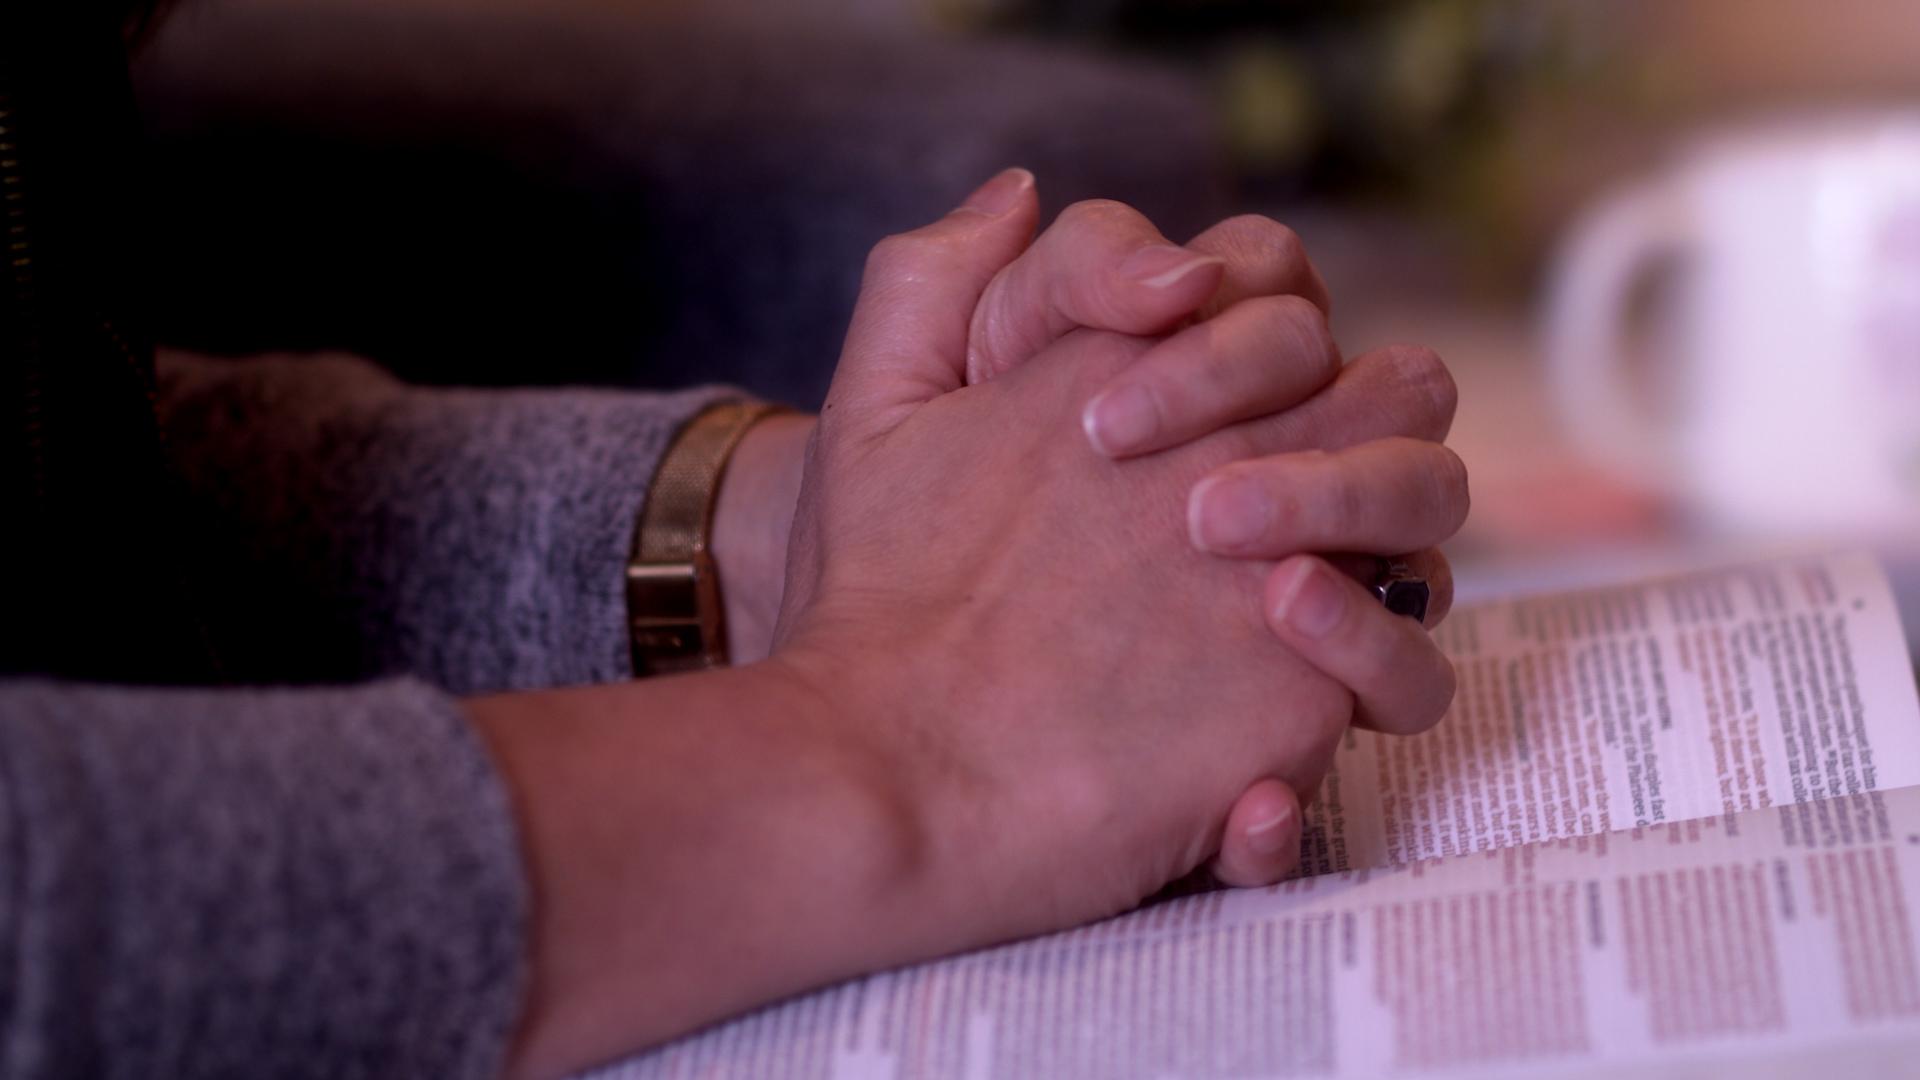 prayerhandswithbible.jpg